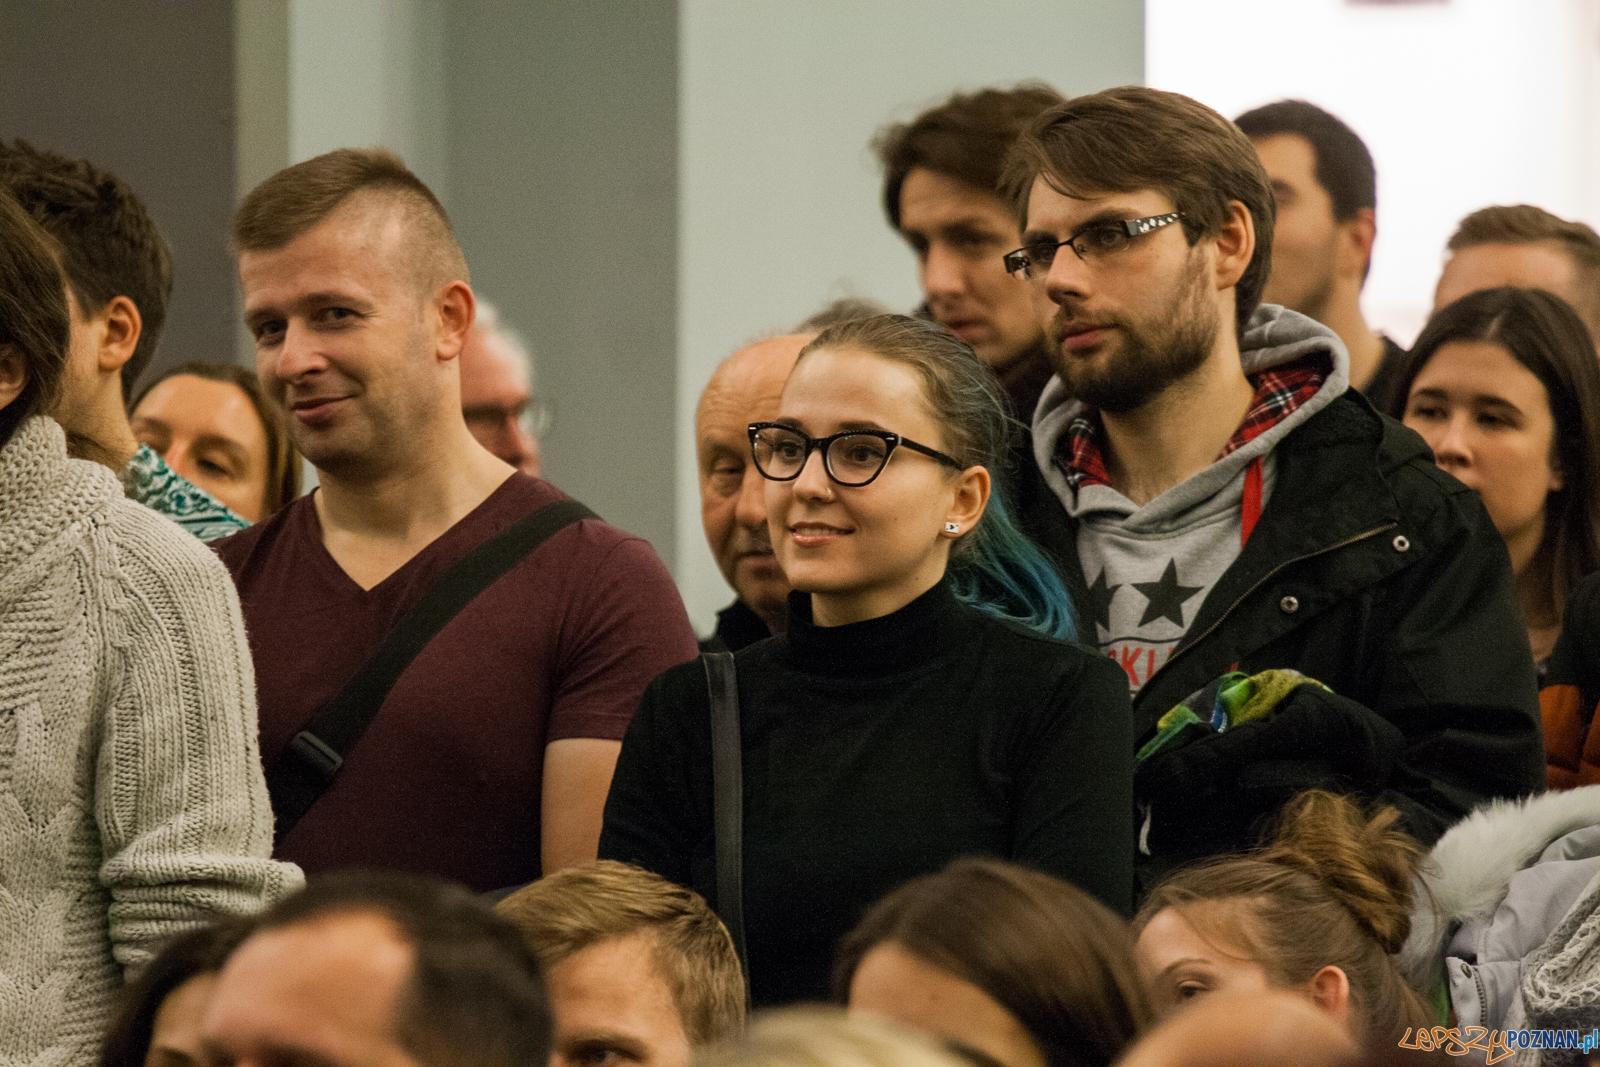 Robert Biedroń (12.11.2016) empik  Foto: © lepszyPOZNAN.pl / Karolina Kiraga